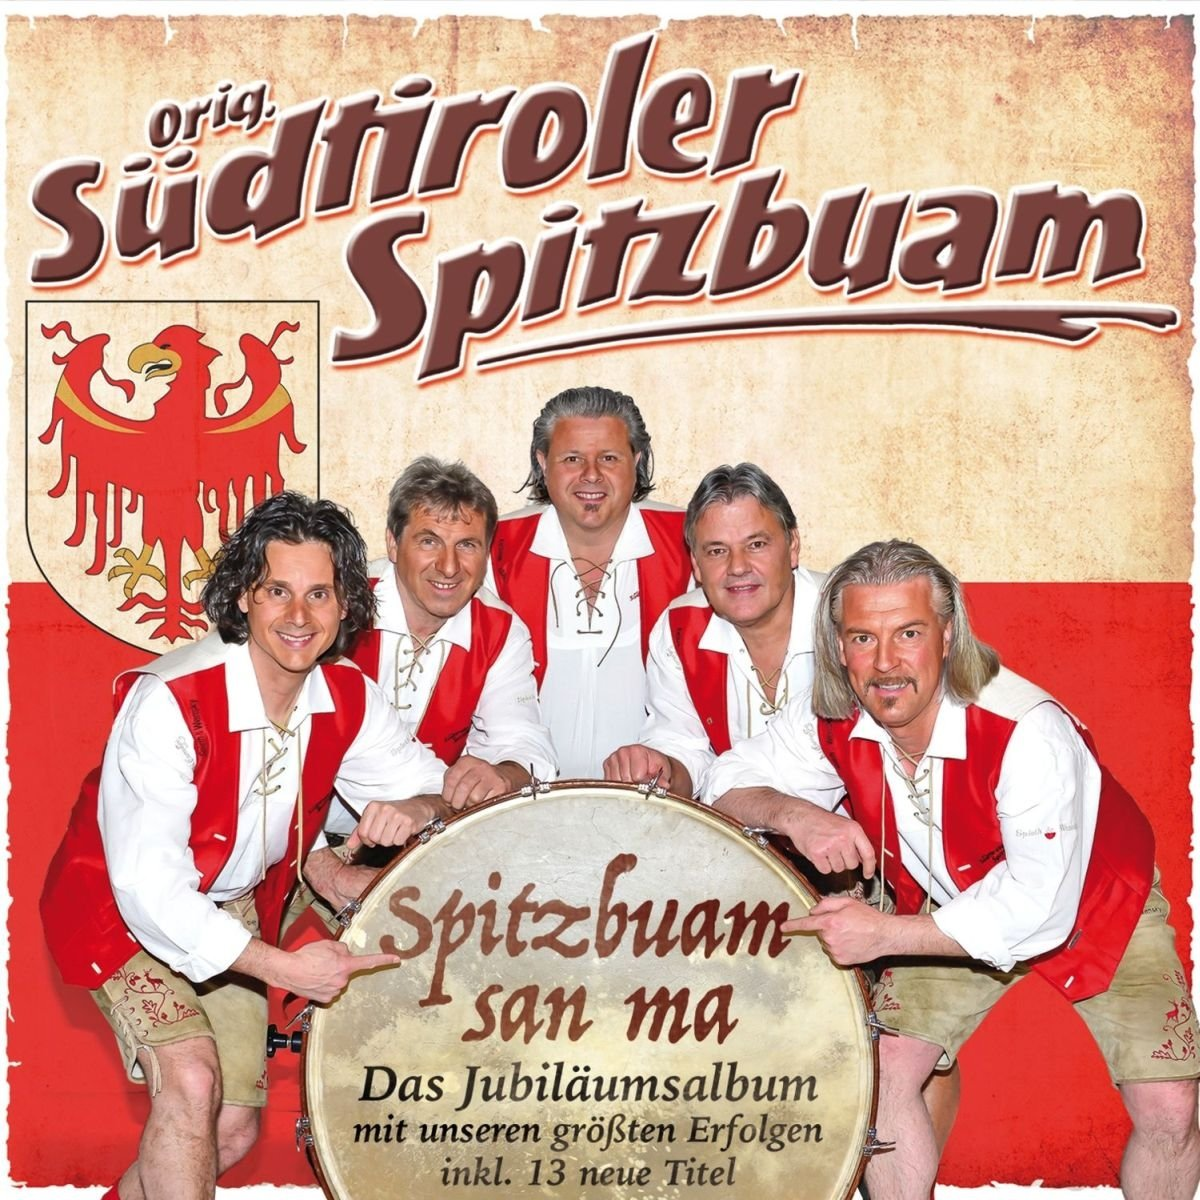 Spitzbuam Recommended Sale San Ma Das Jubilaumsalbum